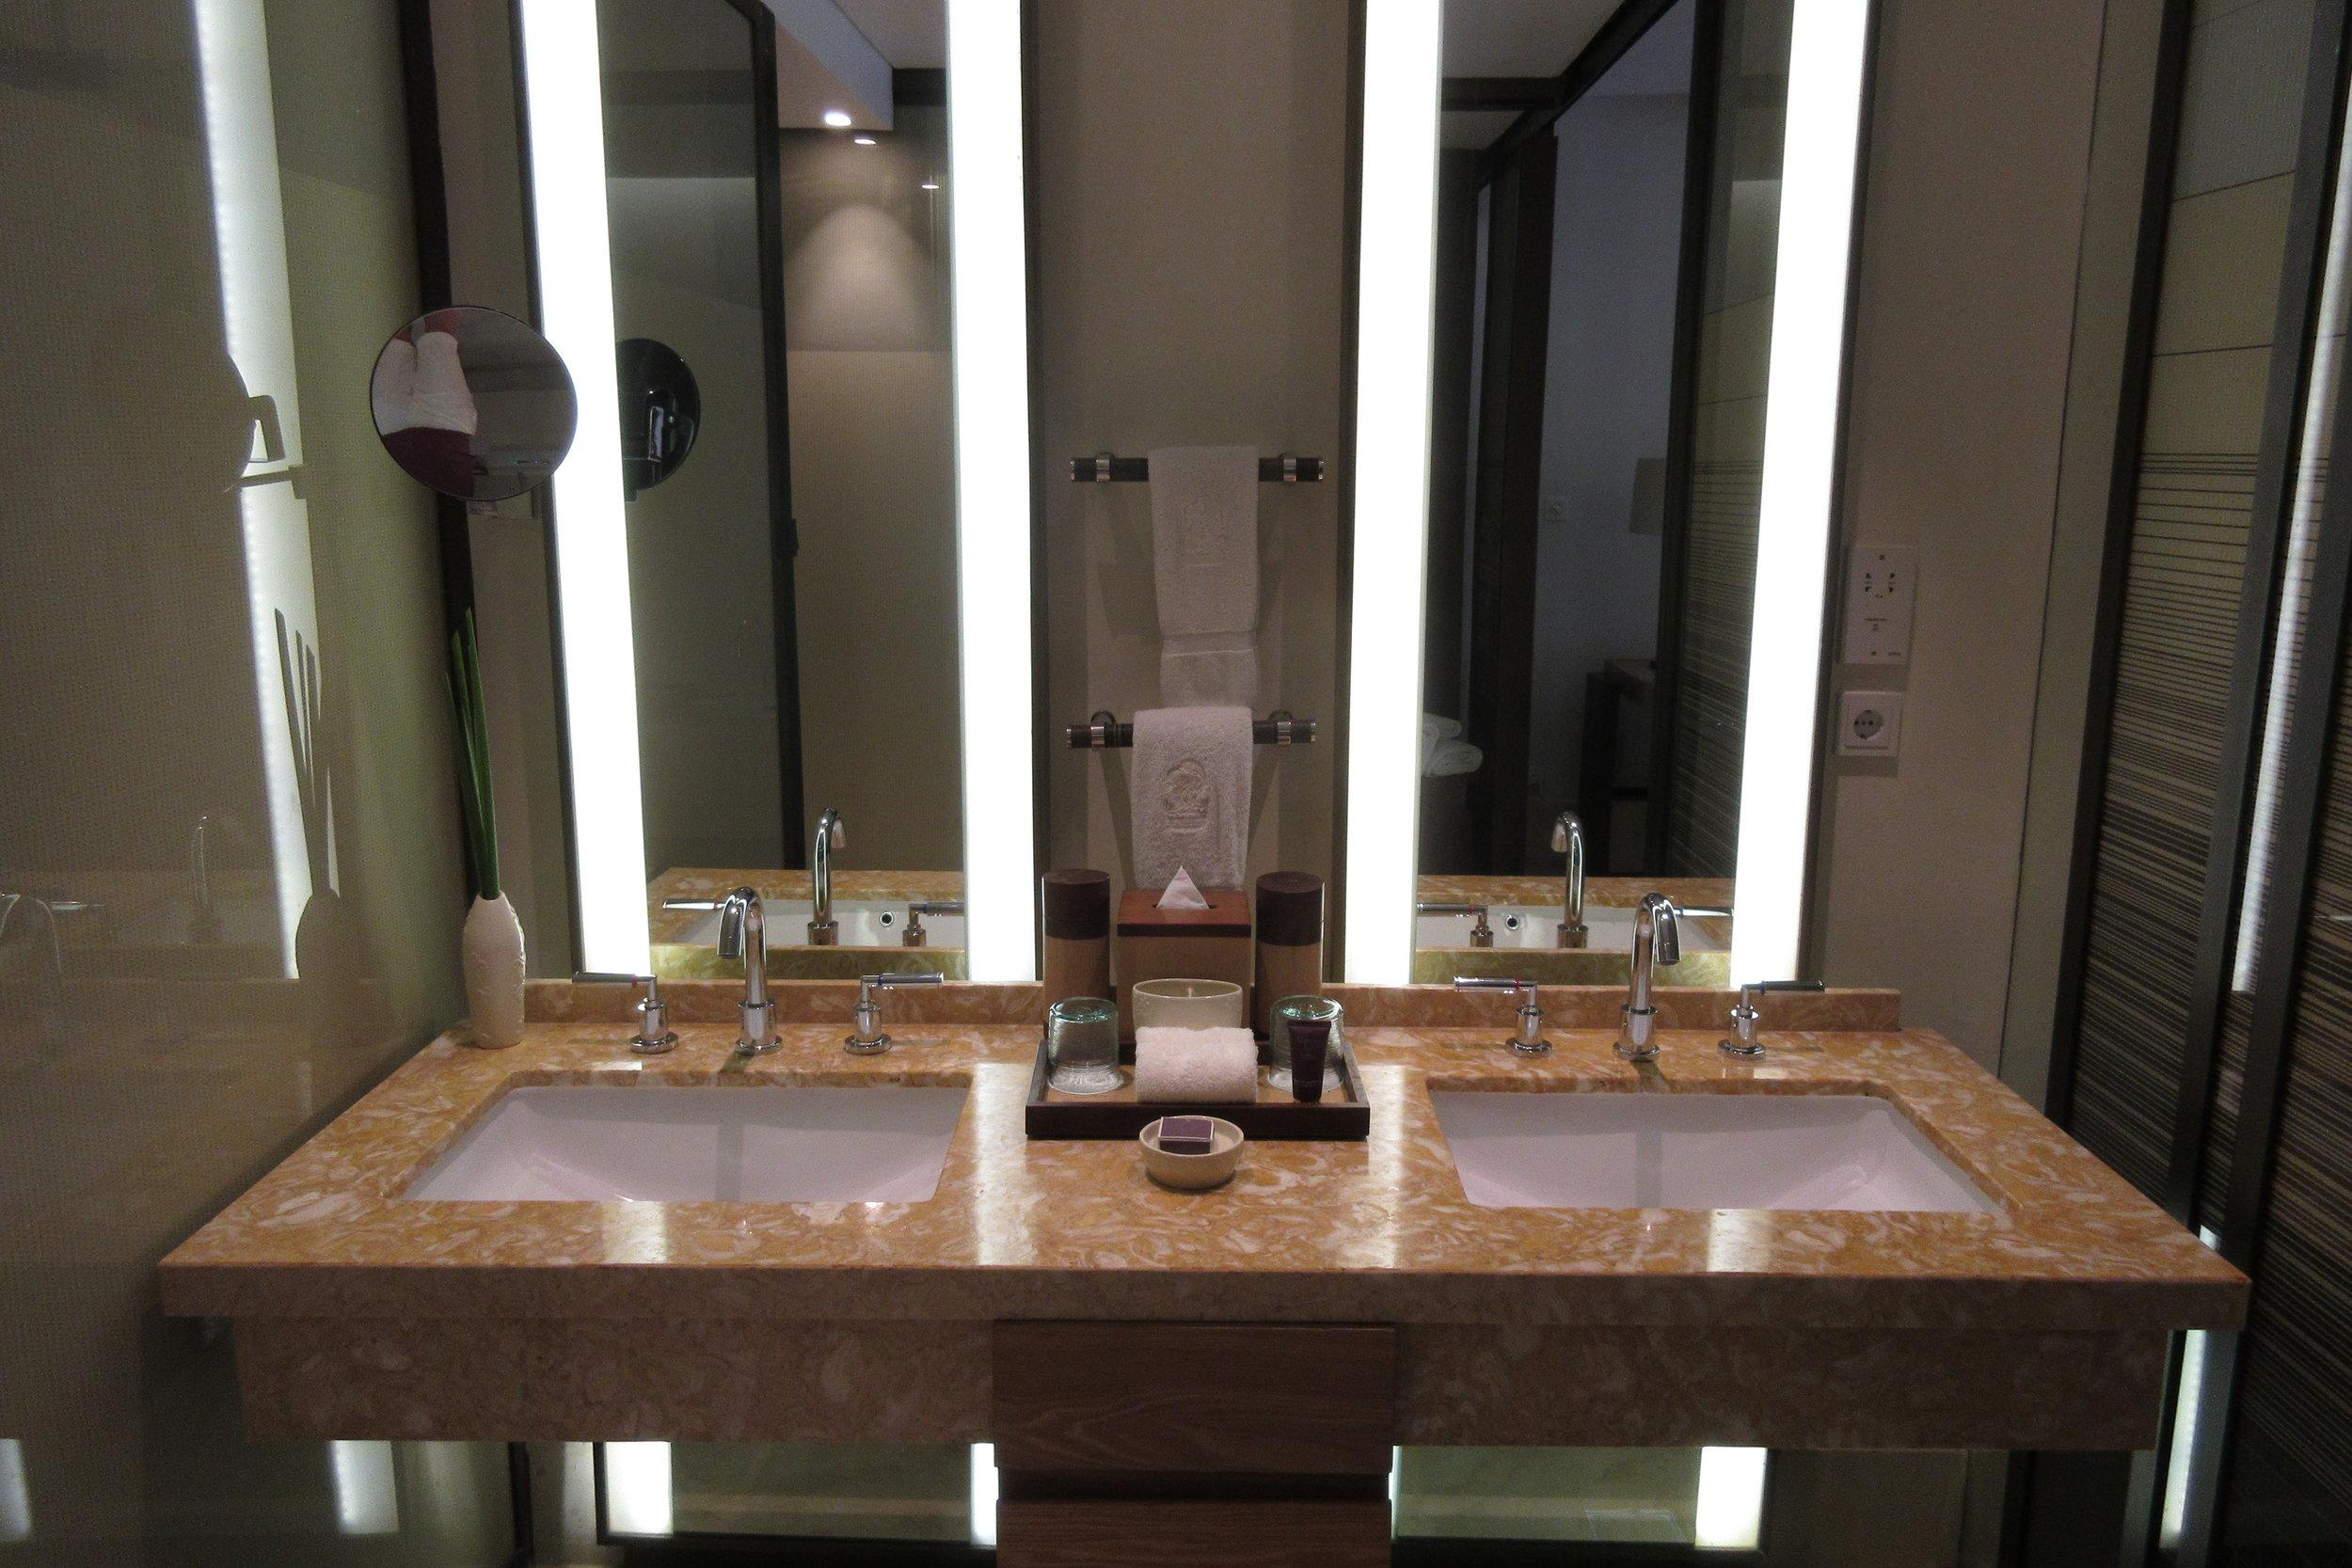 The Ritz-Carlton, Bali – Double sinks